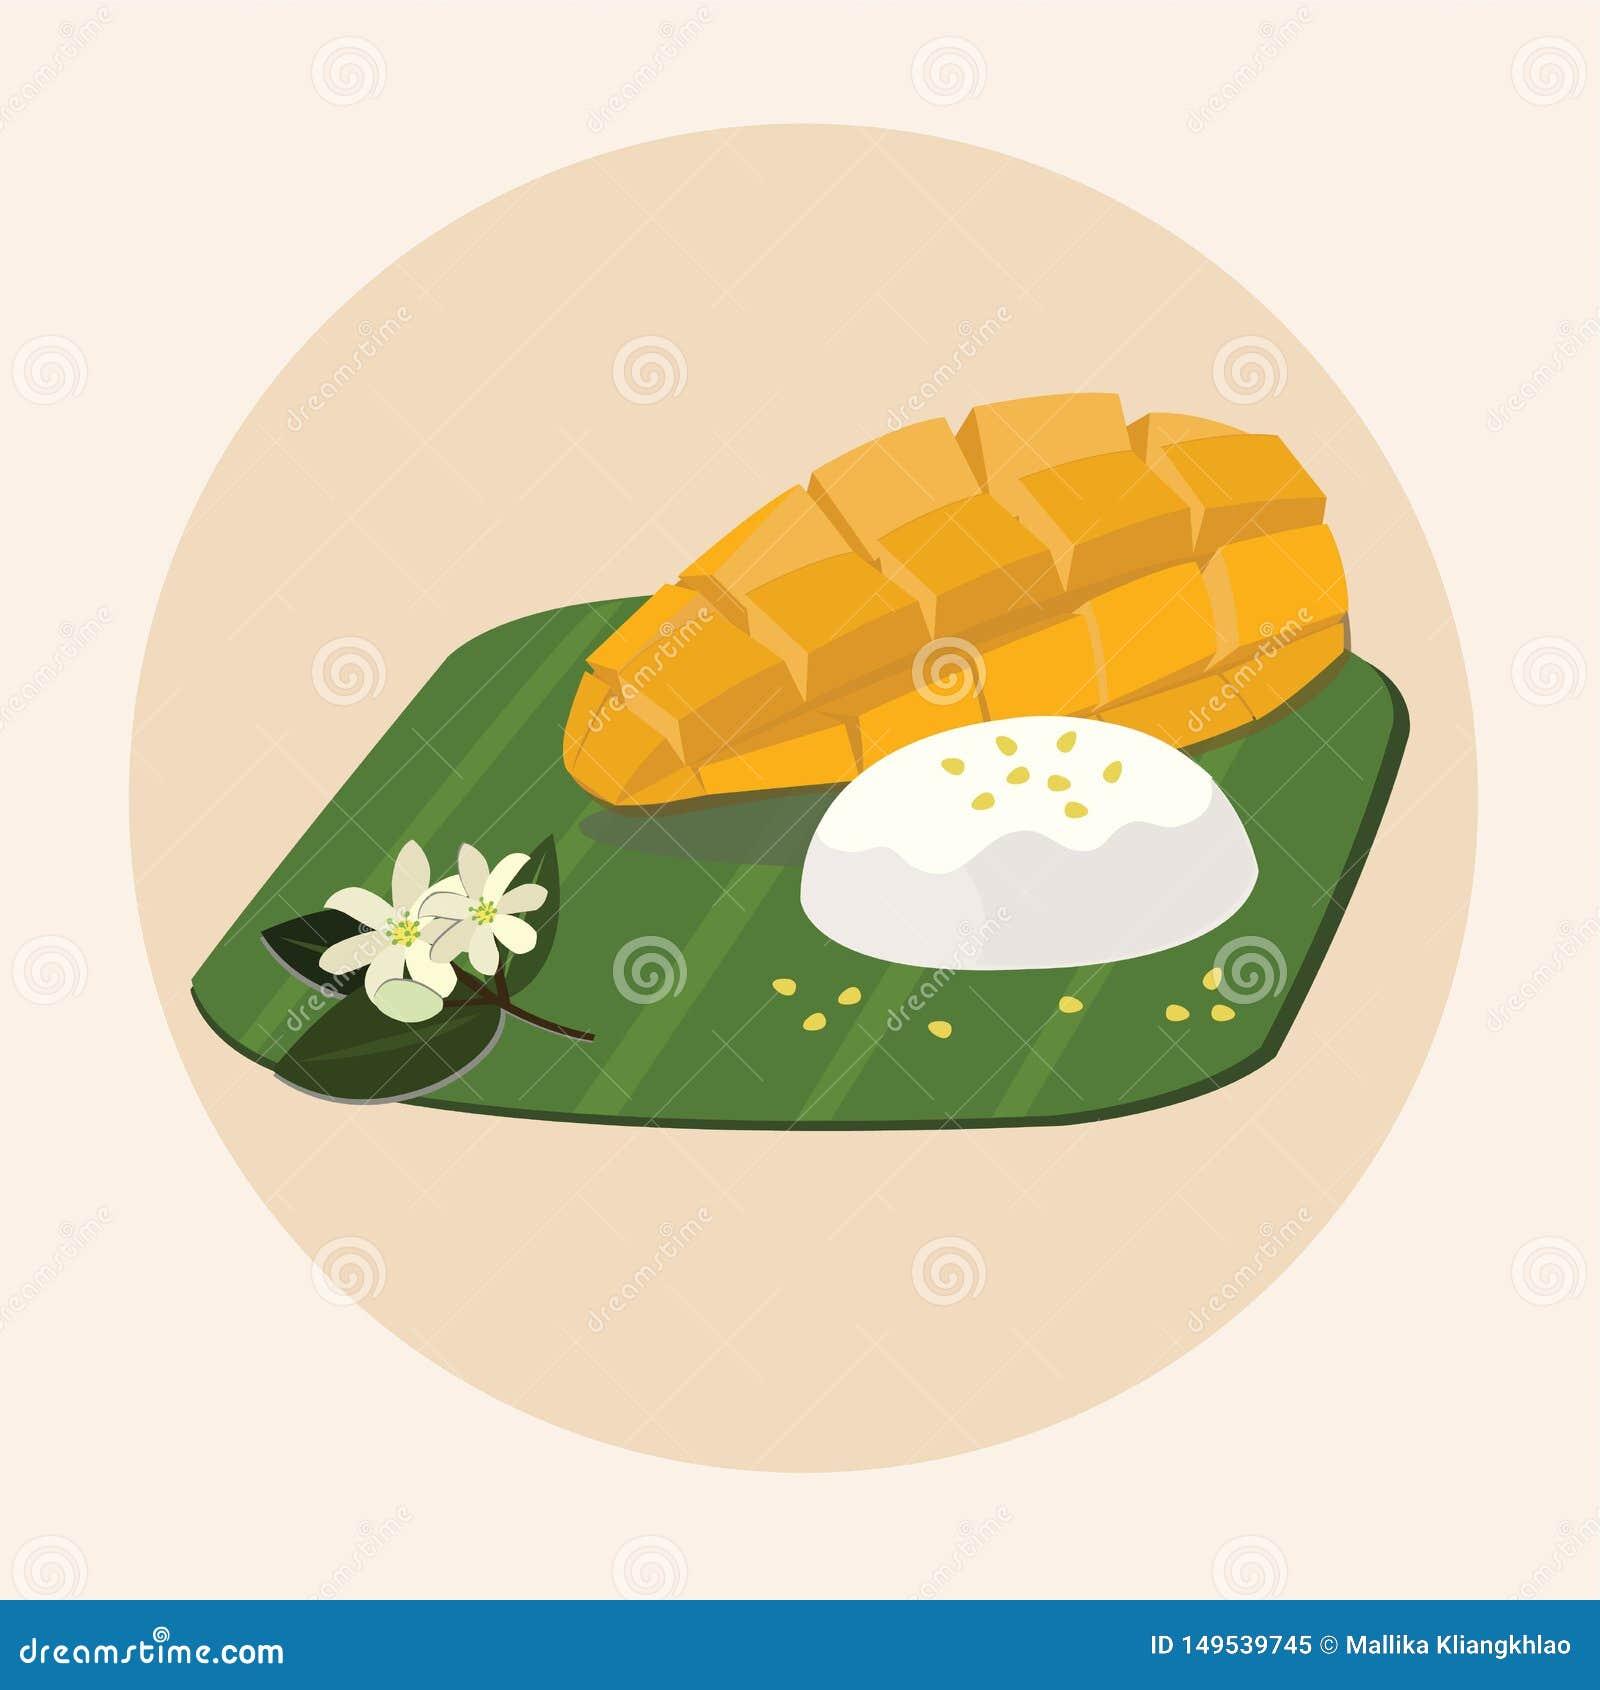 Khao Niew Ma Muang - Thai Sweet Sticky Rice with Mango